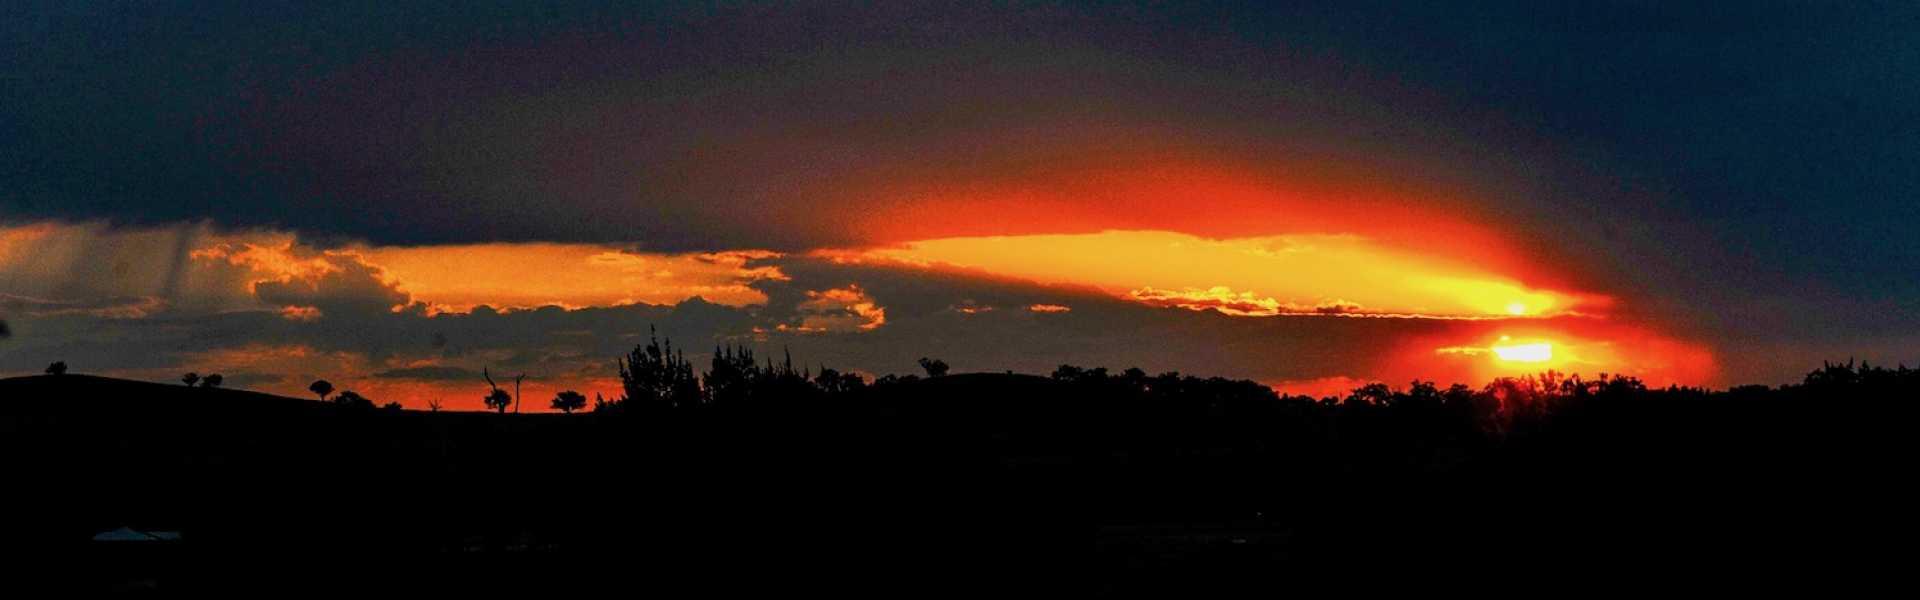 Kui Parks, City Lights Caravan Park, Tamworth, Sunset